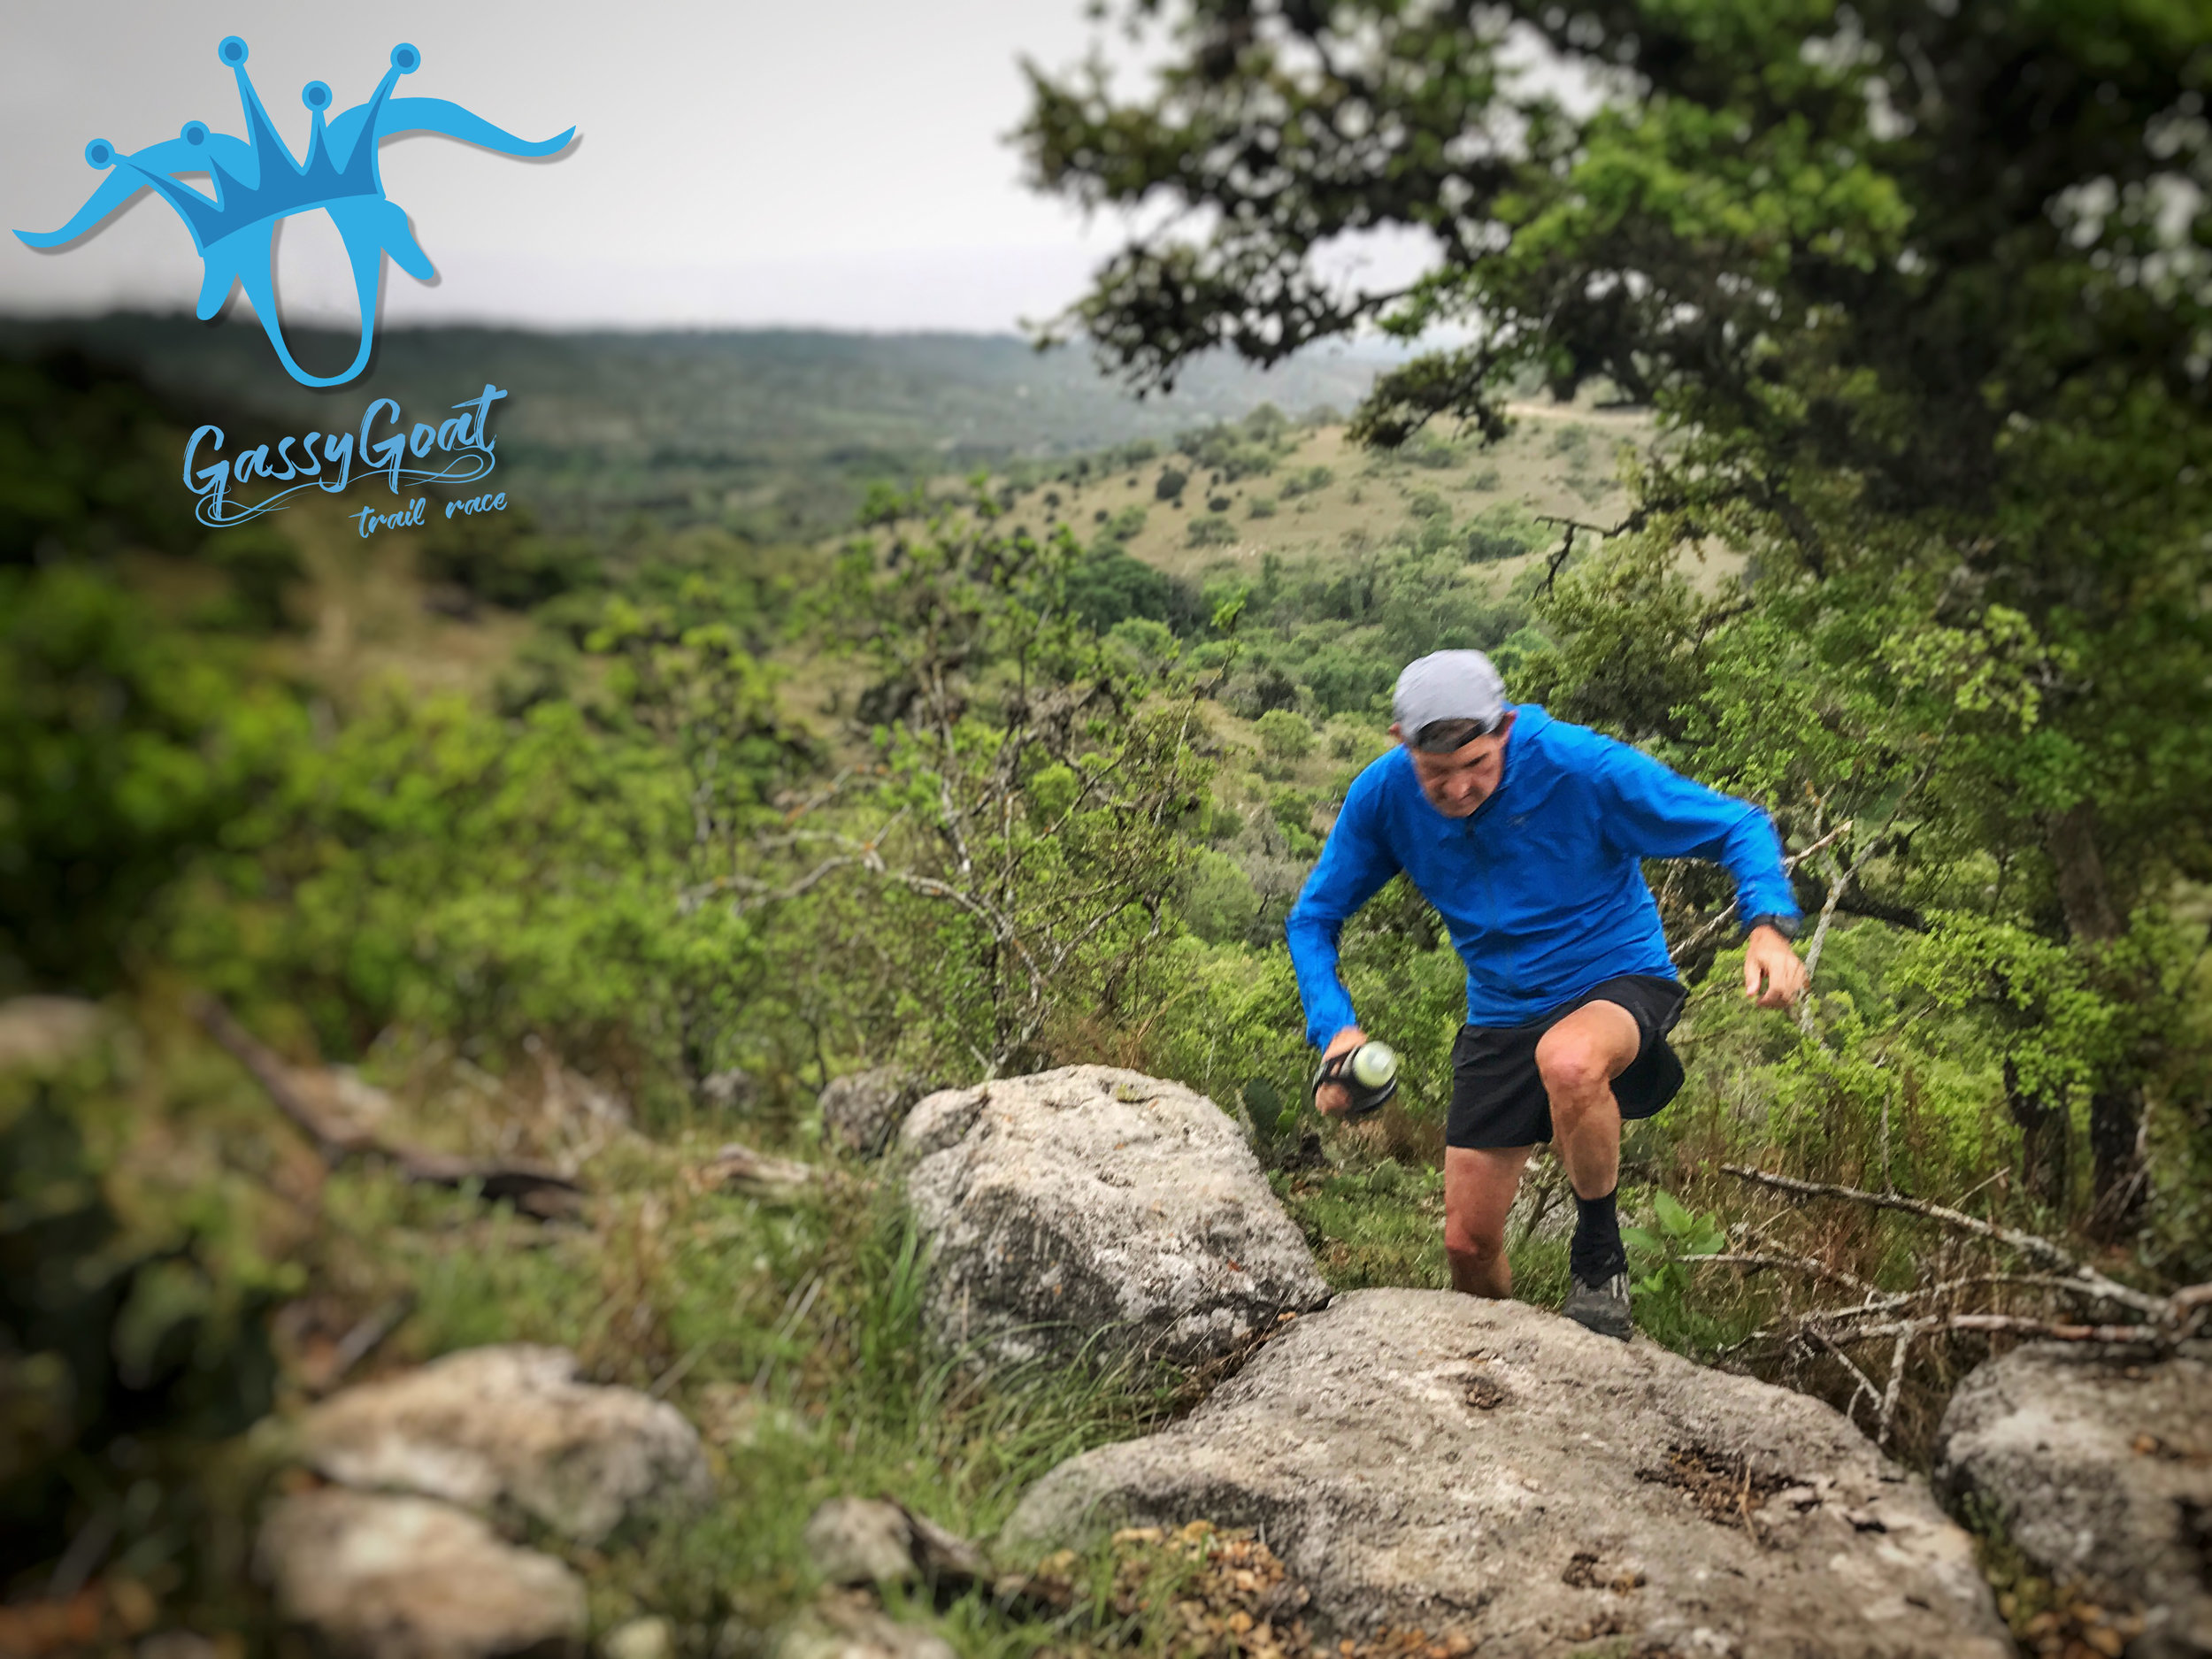 Gassy Goat - 5 Mile . 20km . 40km . 4K Hill Challenge . 1 Mile Kid ClassicOctober 12, 2019